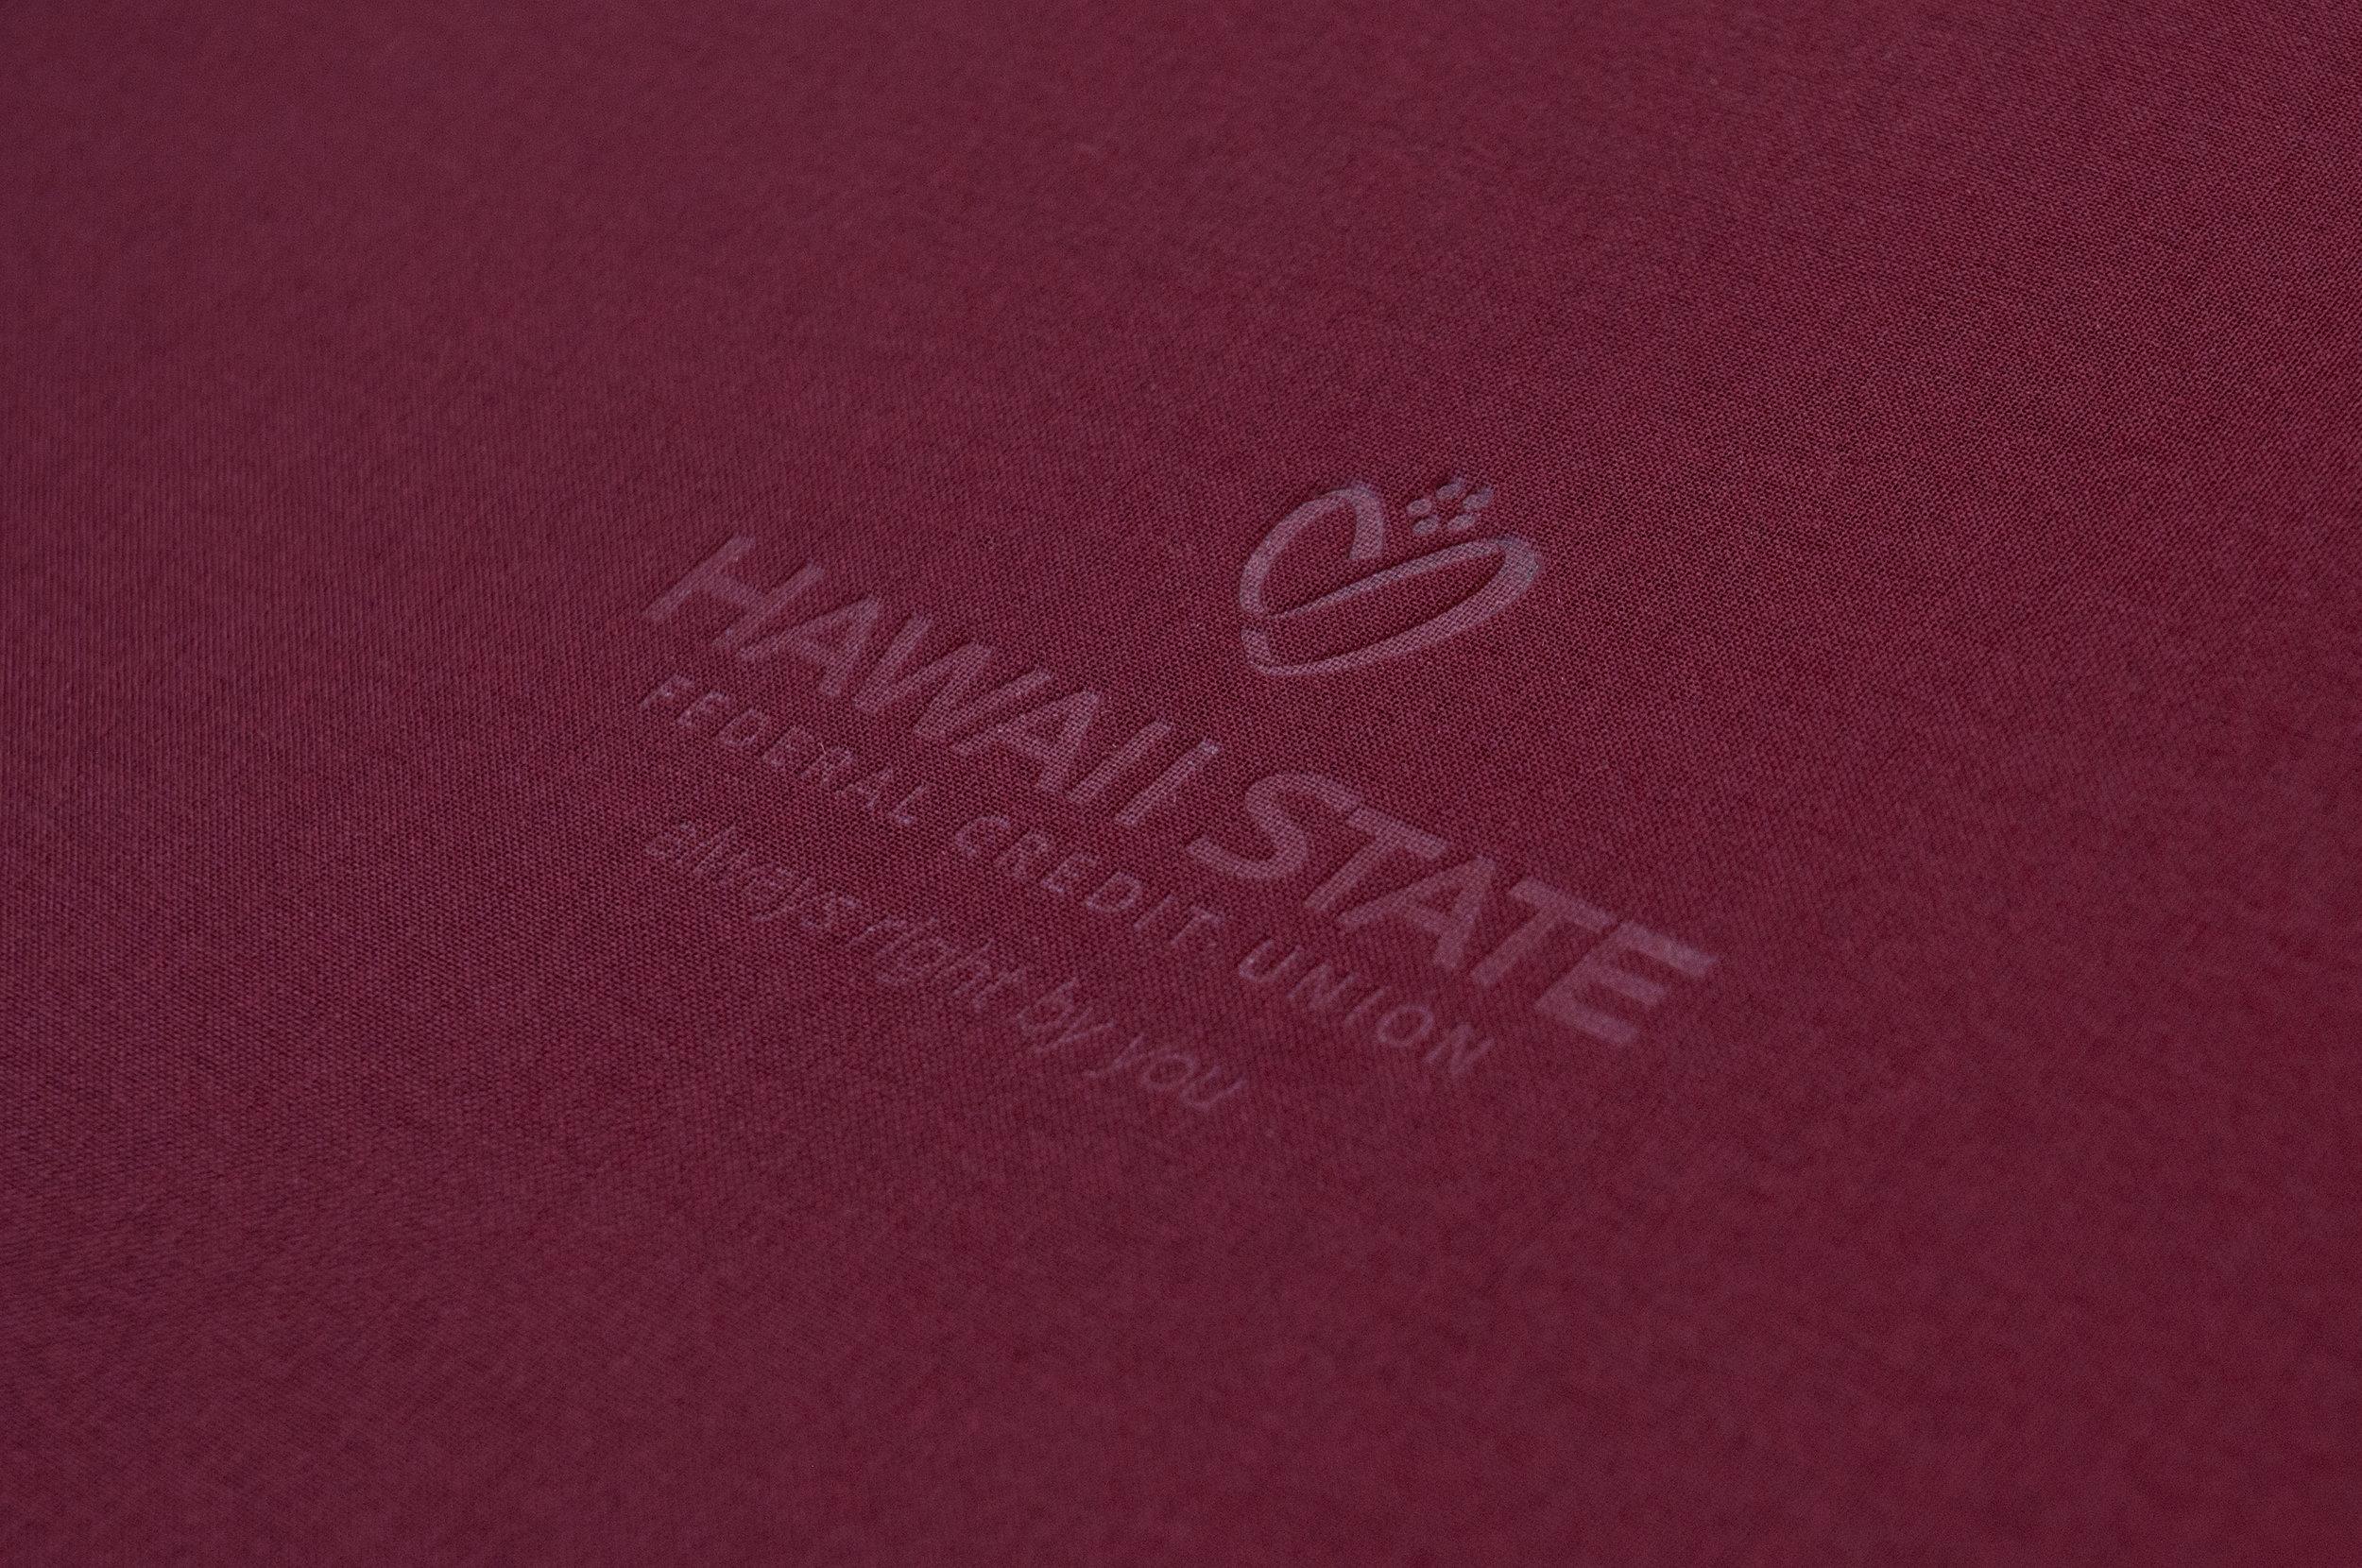 2014_Hardcover_Hawaii_2_8bit.jpg